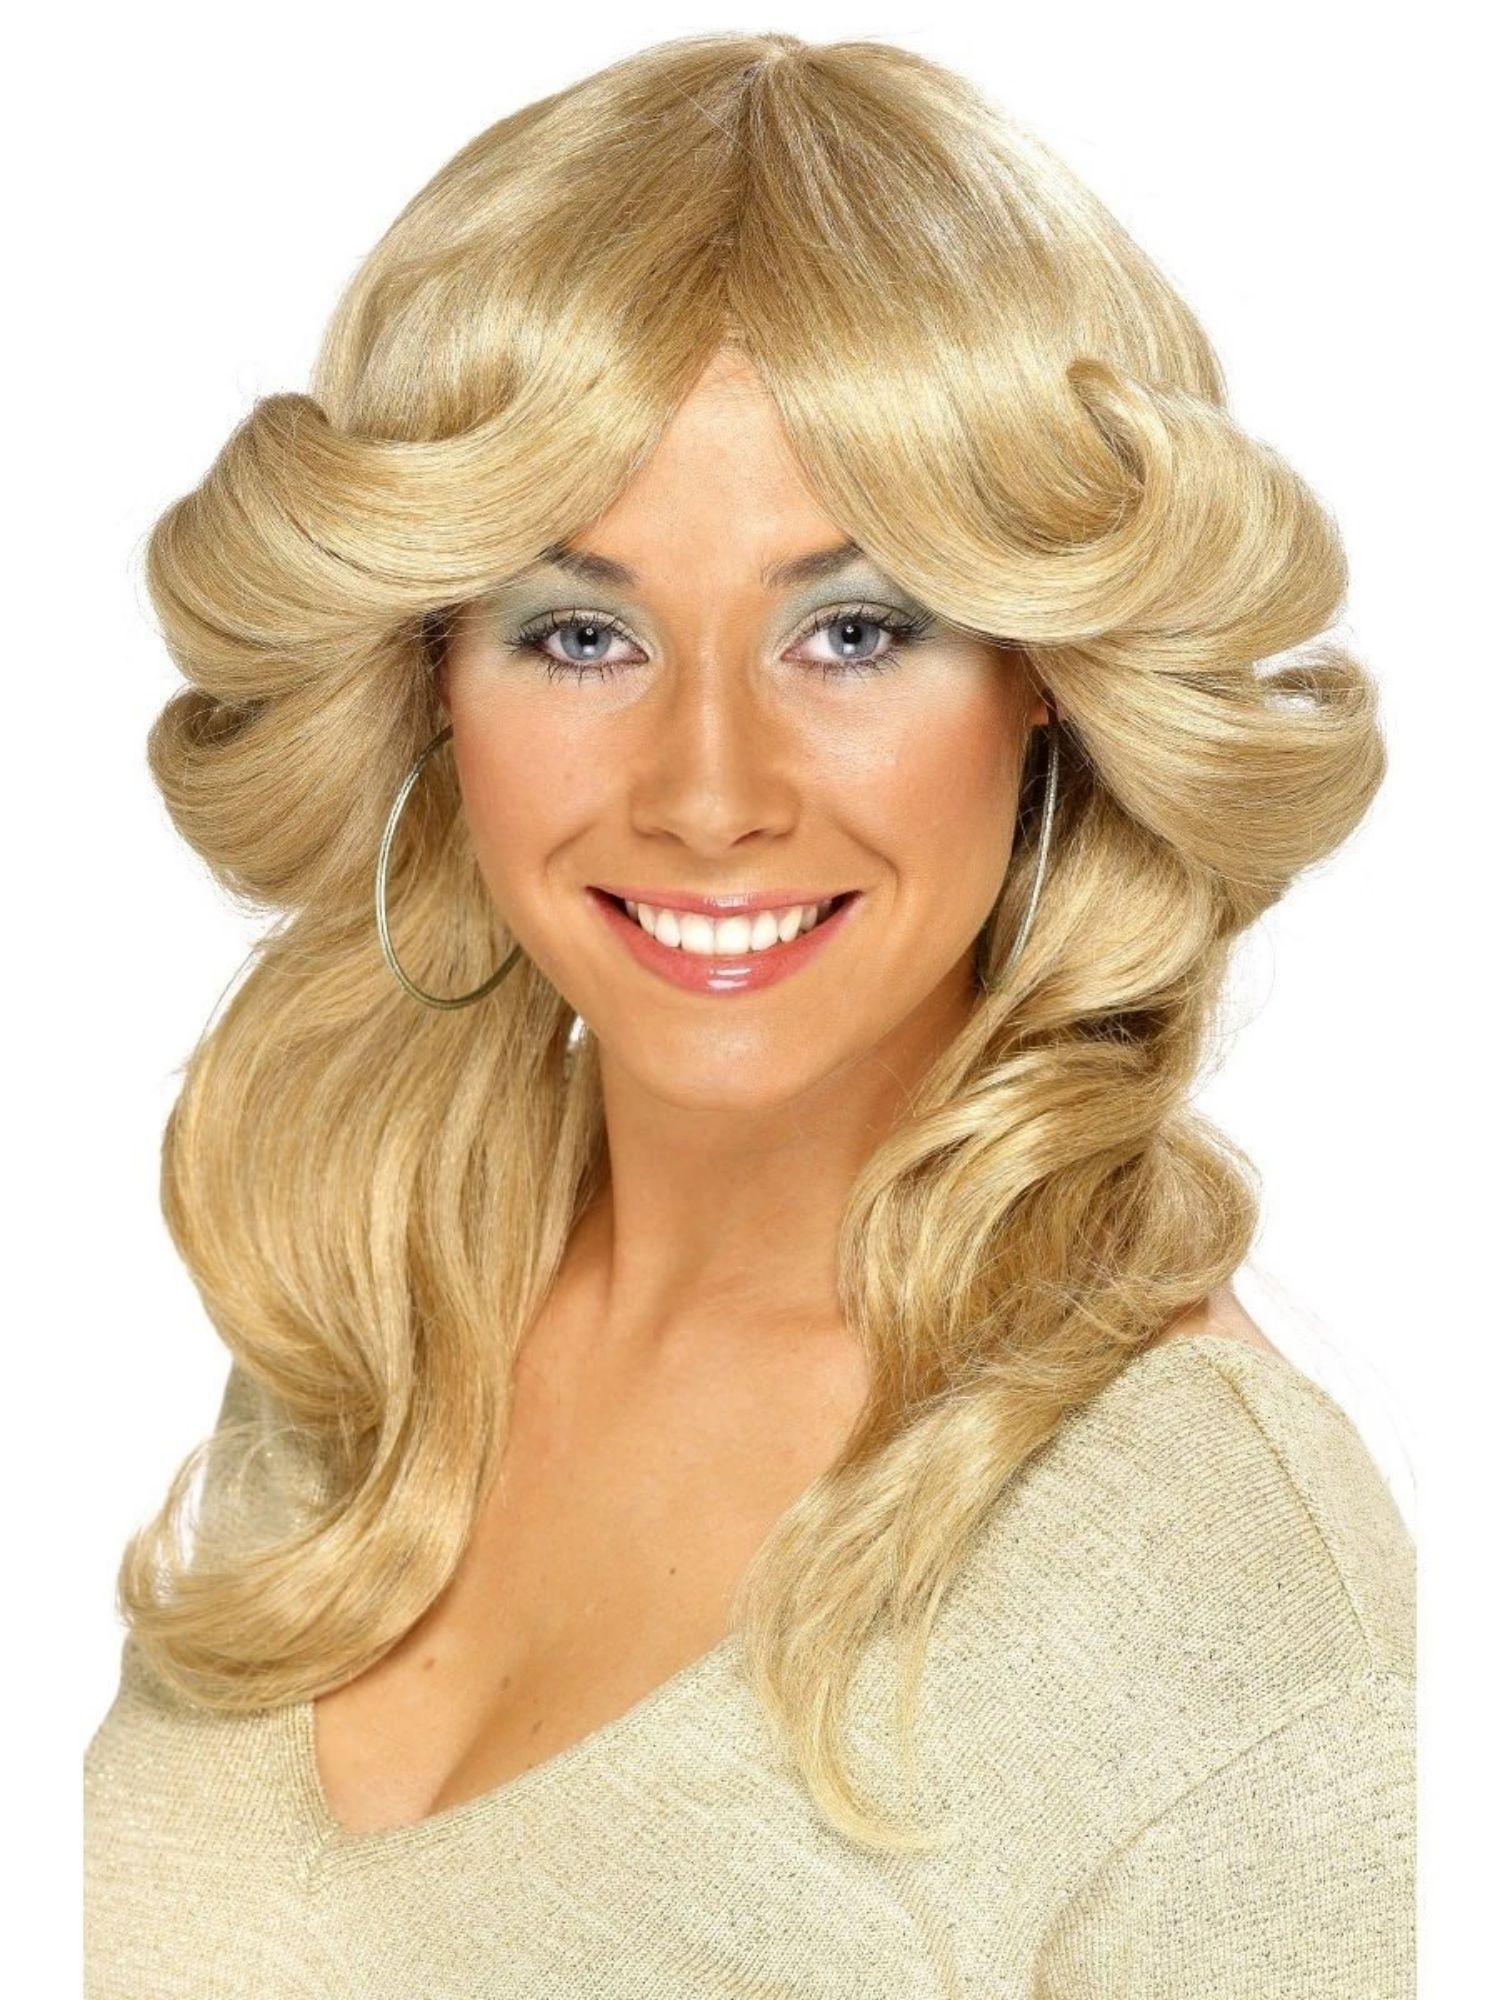 Ladies Long Balck Wavy Wig Charlies Angels Celebrity Style Fancy Dress